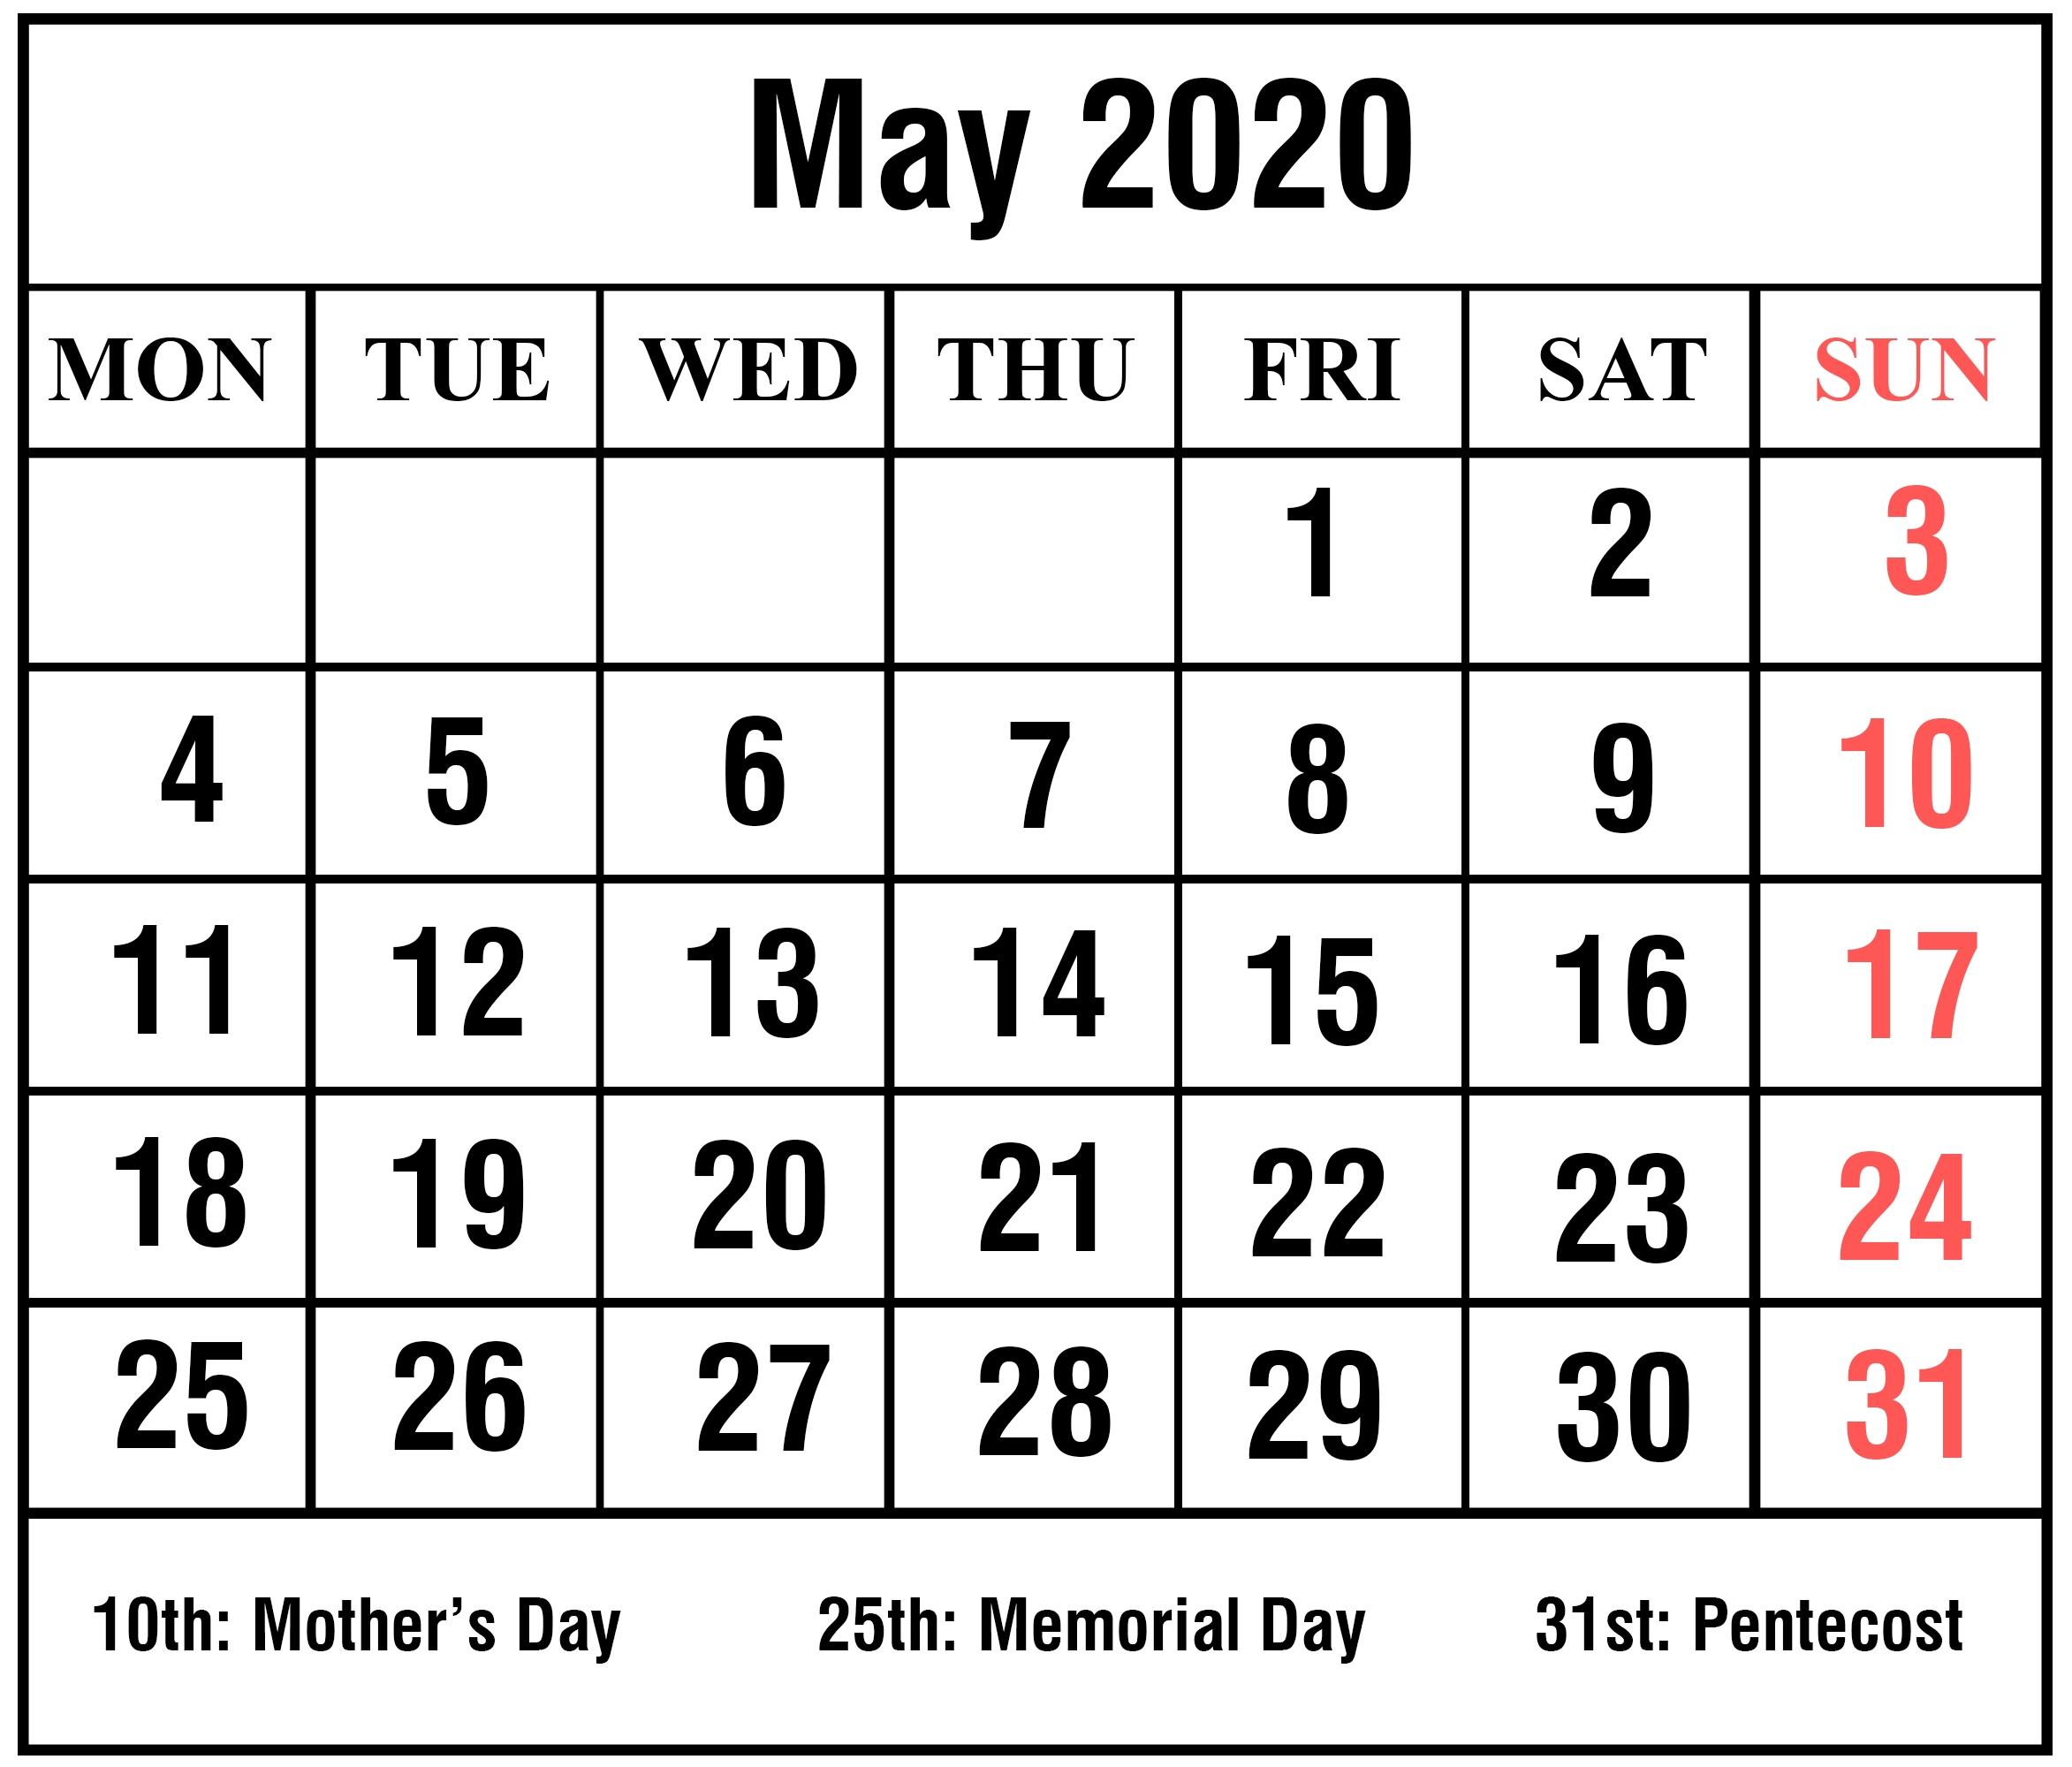 Editable May 2020 Calendar To Print Pdf Word Blank Blank Templates Notes